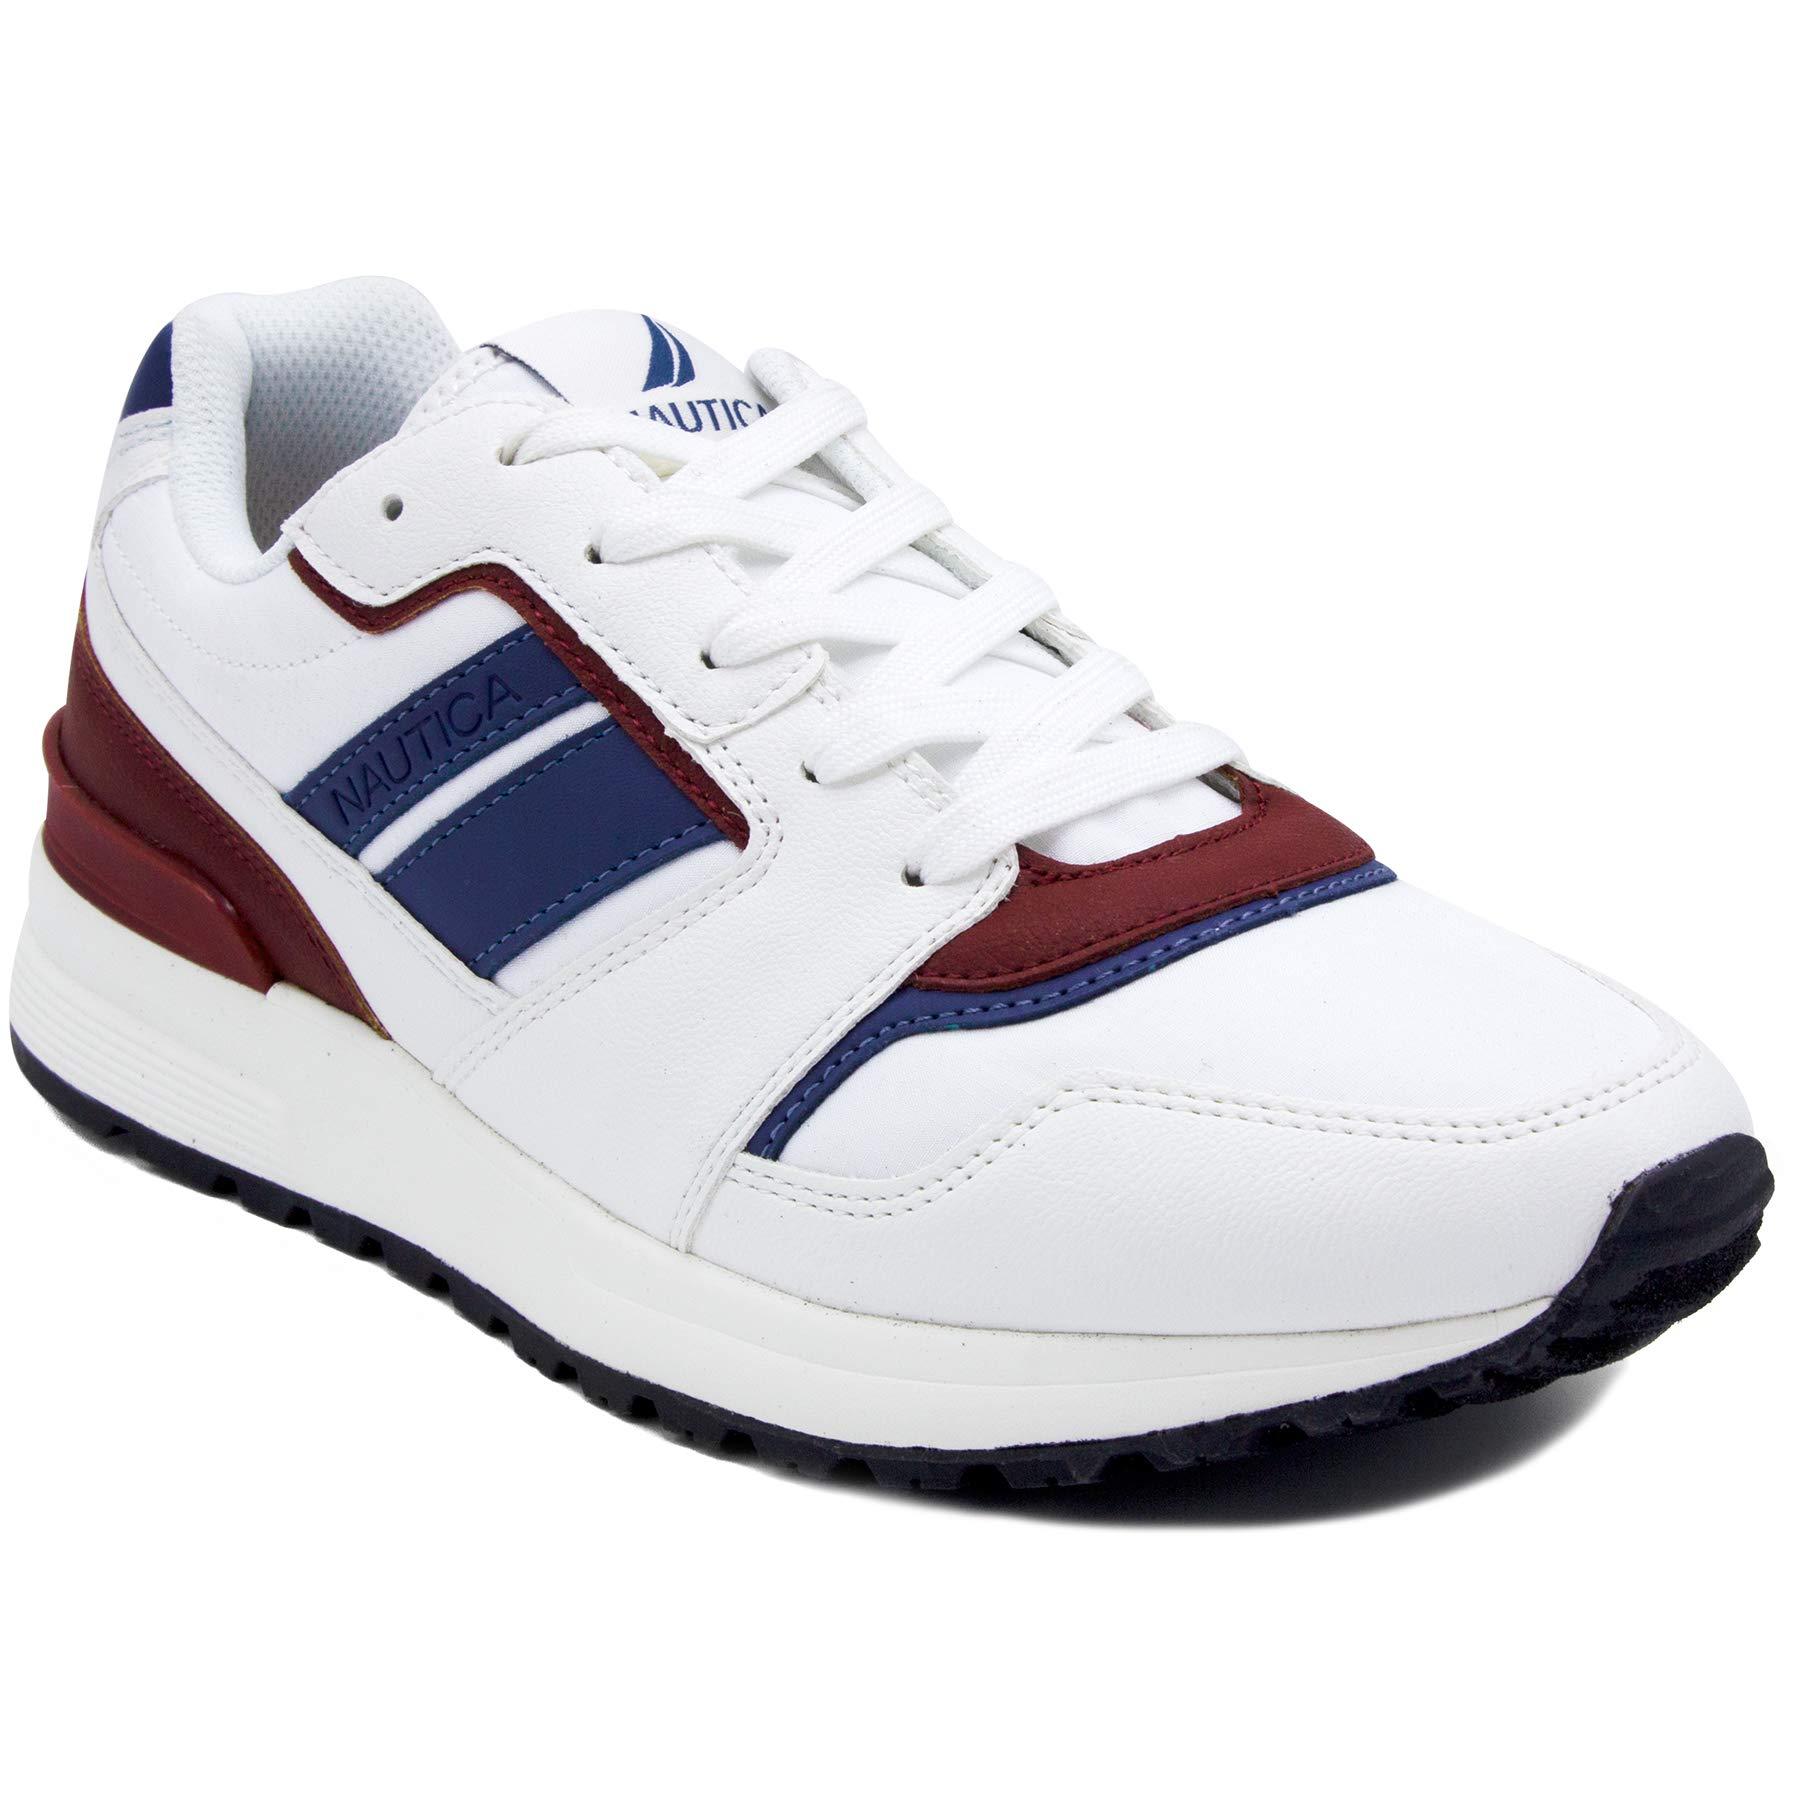 Nautica Mens Casual Lace-Up Fashion Sneakers Oxford Comfortable Walking Shoe